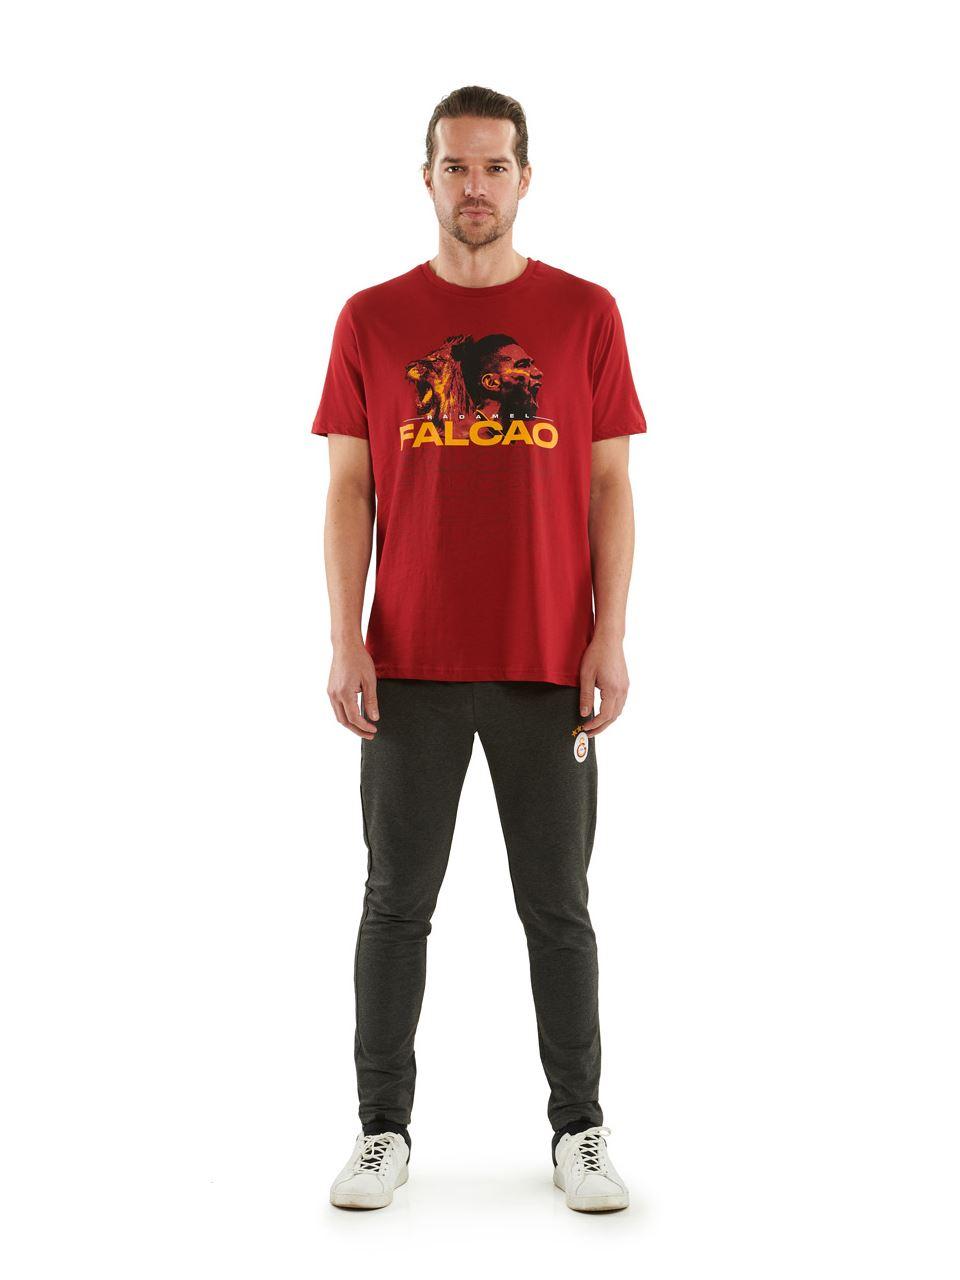 Galatasaray Falcao Aslan Erkek T-shirt E191282